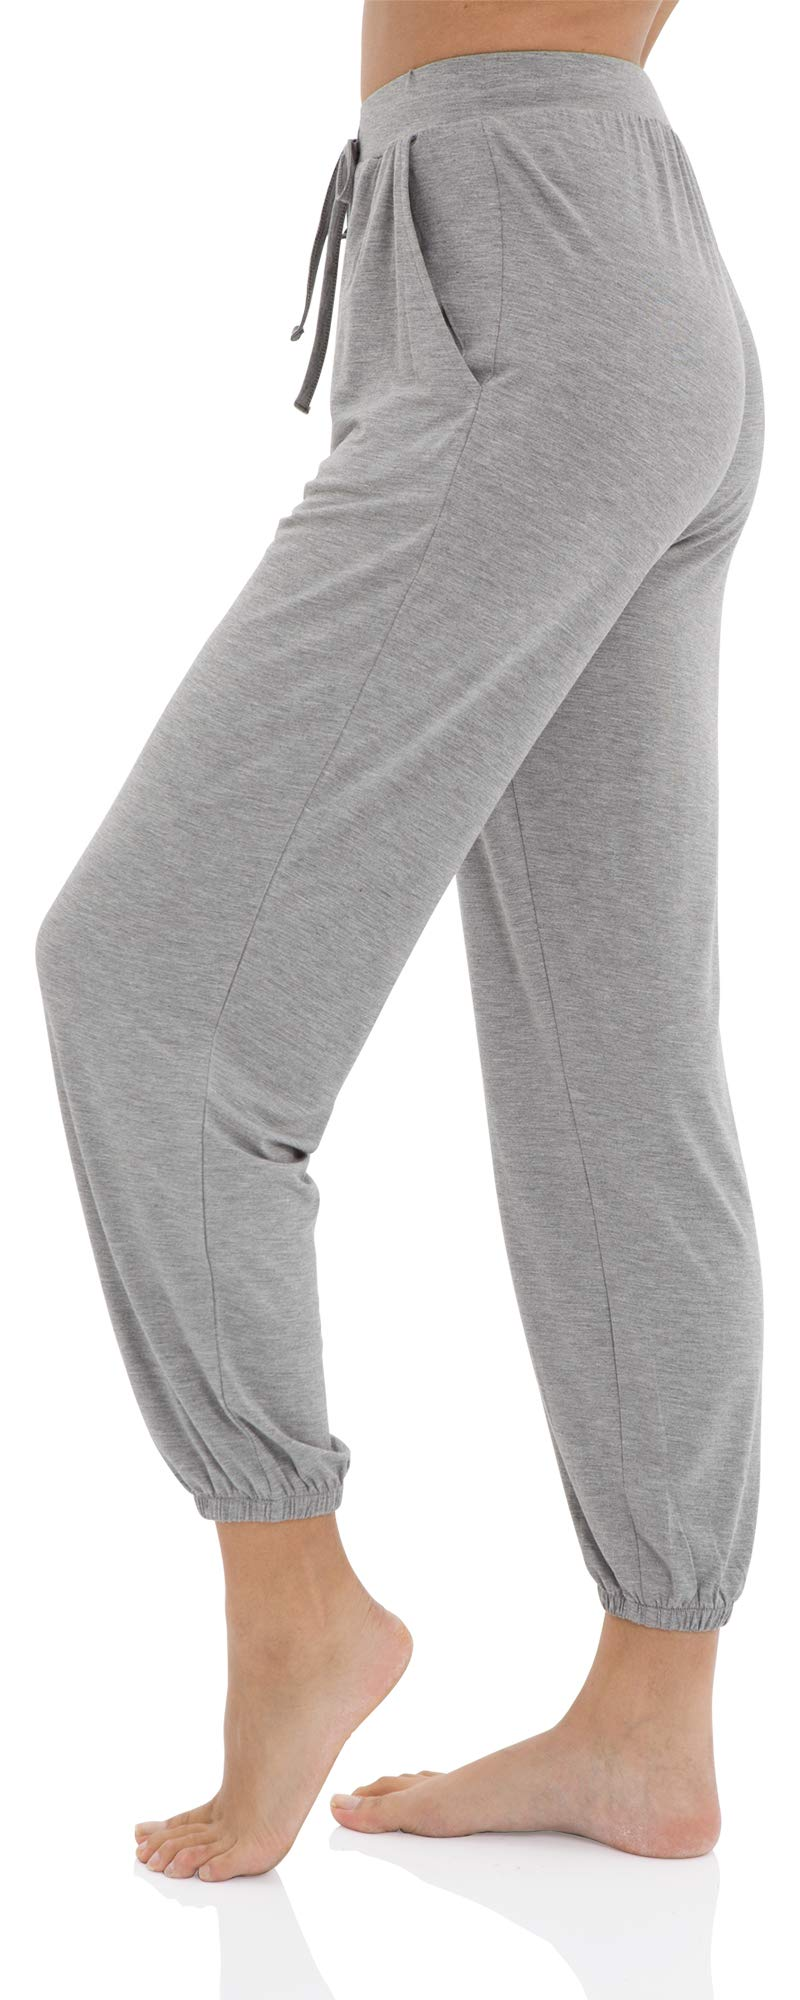 WiWi Womens Bamboo Soft Loungewear Lounge Jogger Pants Pajama Bottoms Comfy Plus Size Sleepwear Pant S-4X